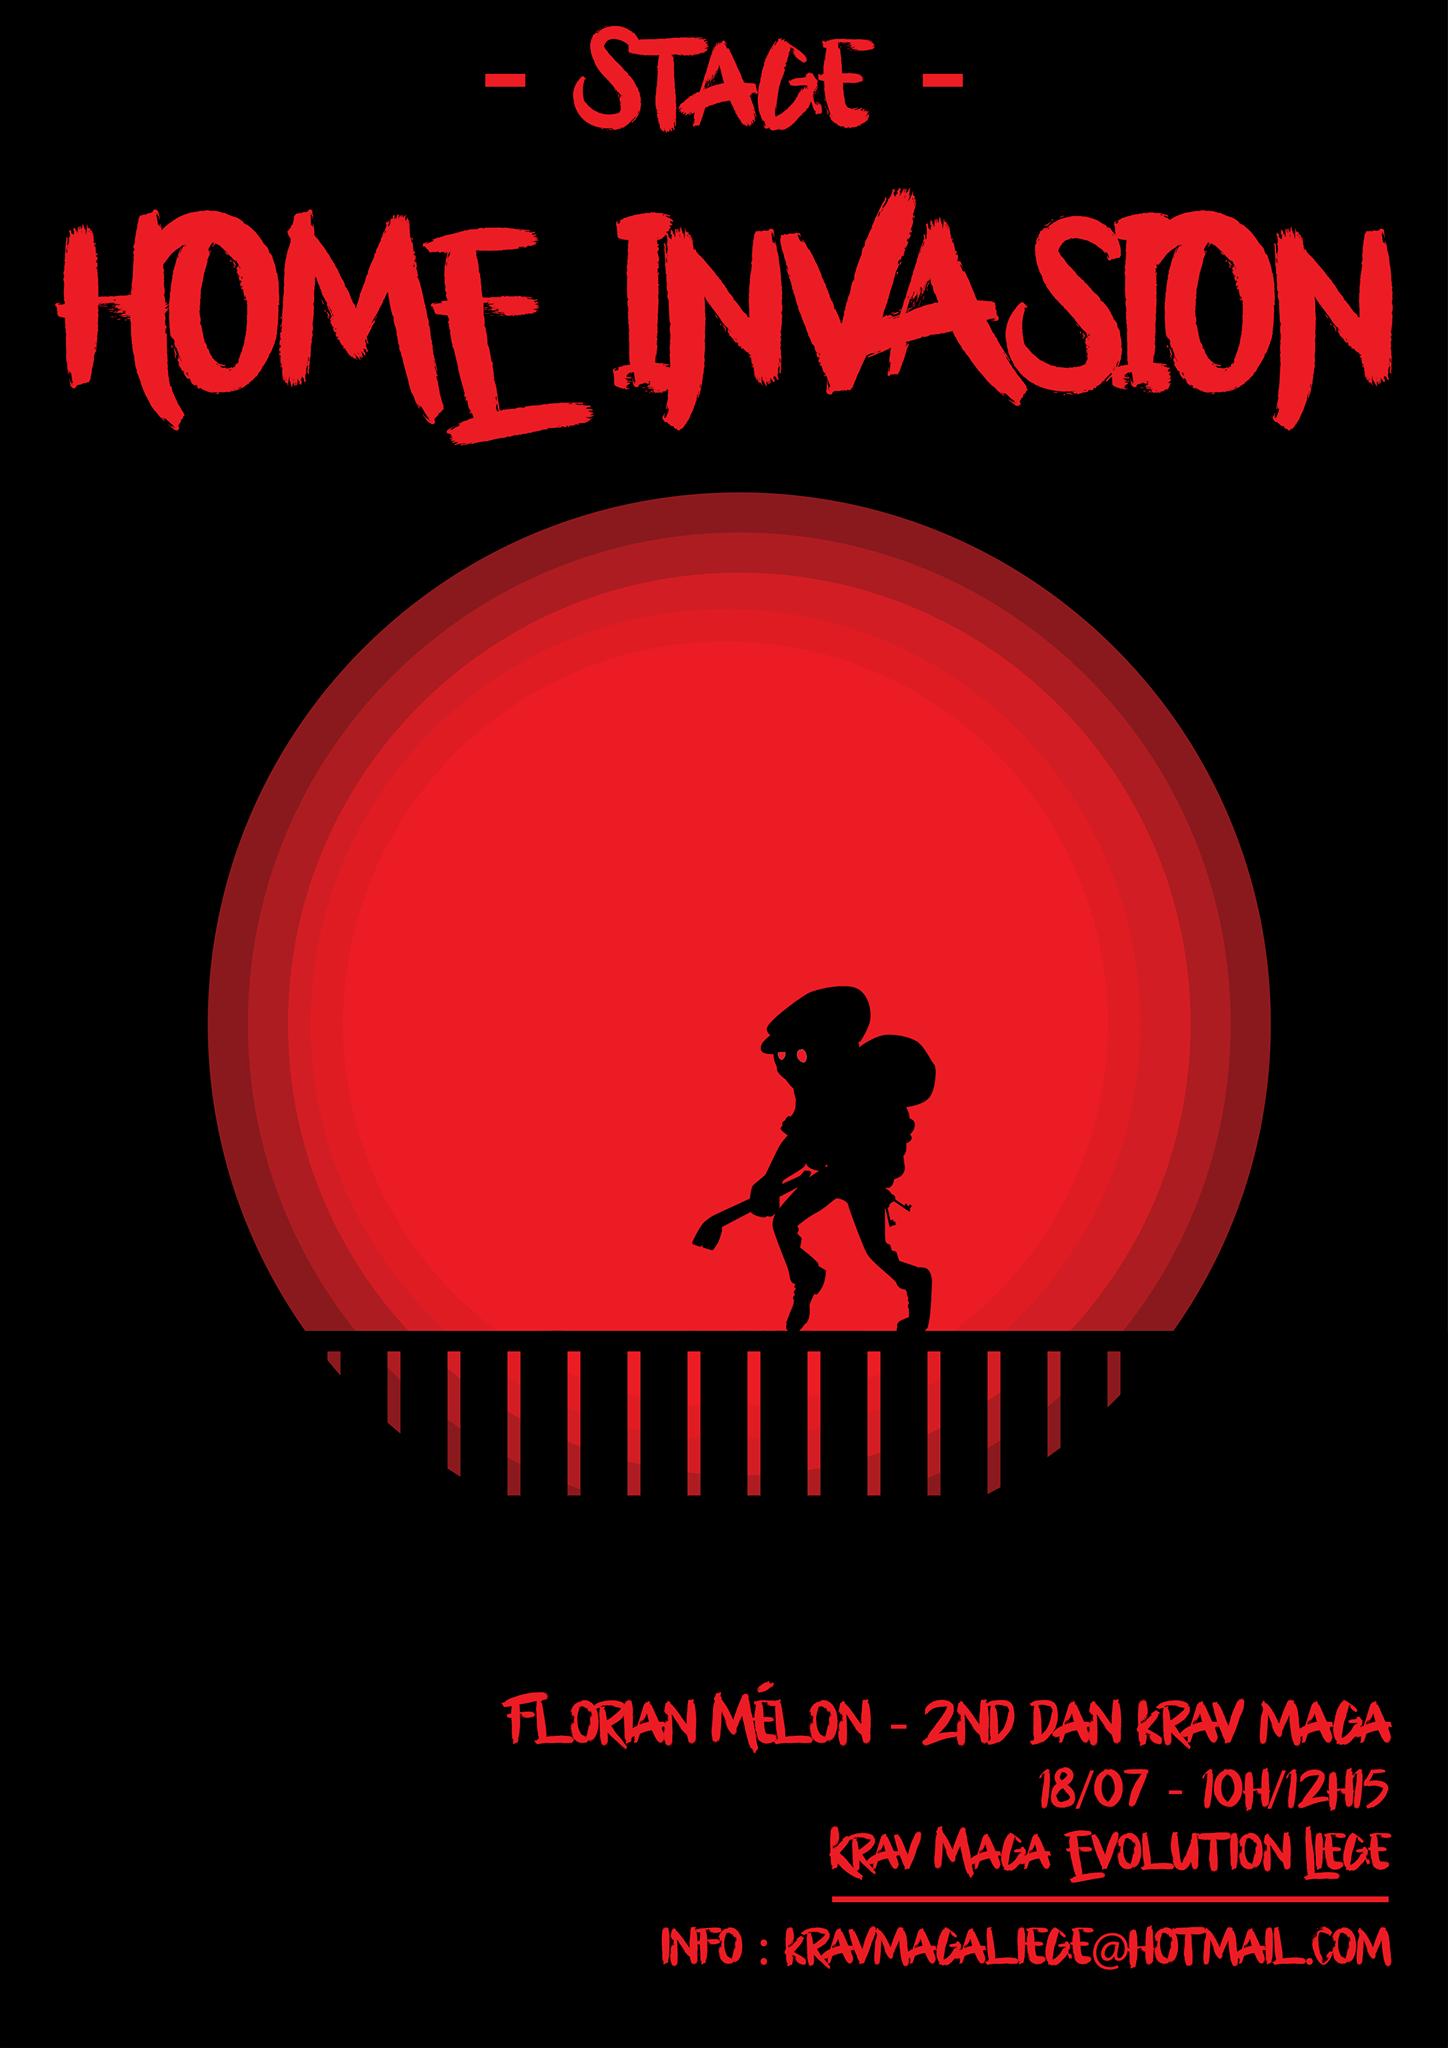 Stage krav maga home invasion